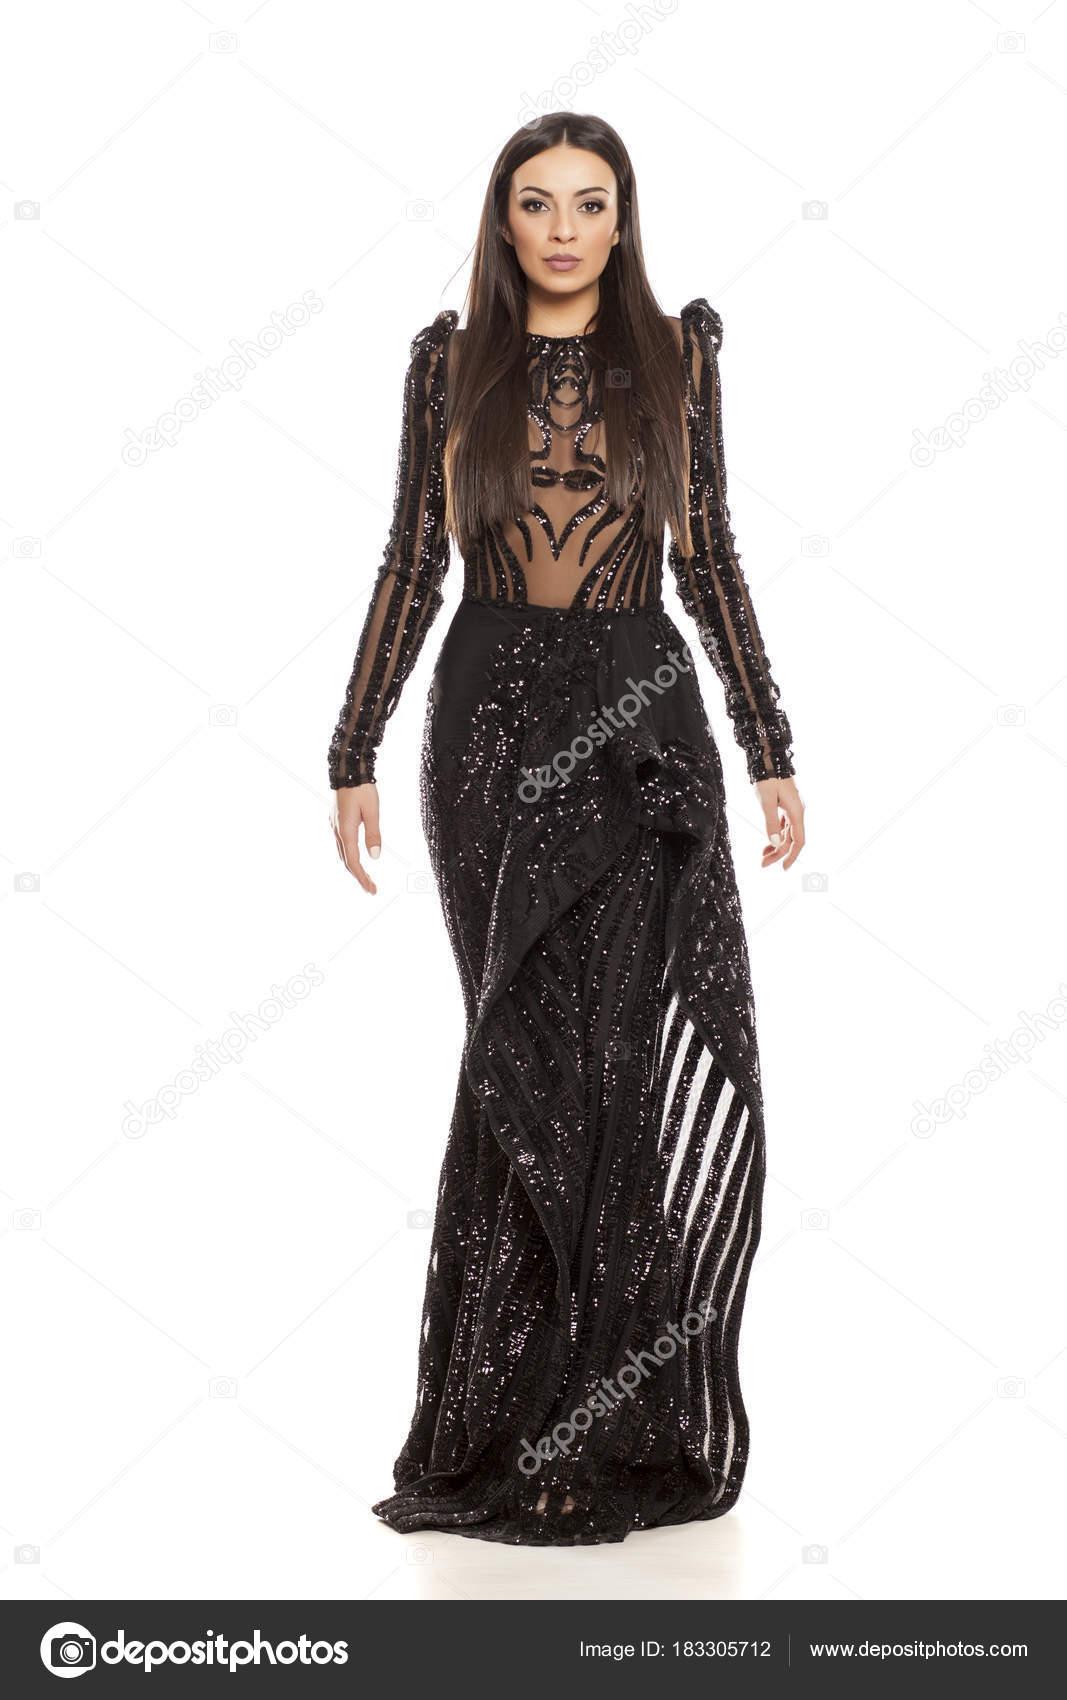 509c8e7cb1ac Νεαρή Όμορφη Γυναίκα Στο Μαύρο Βραδινό Φόρεμα Λευκό Φόντο — Φωτογραφία  Αρχείου